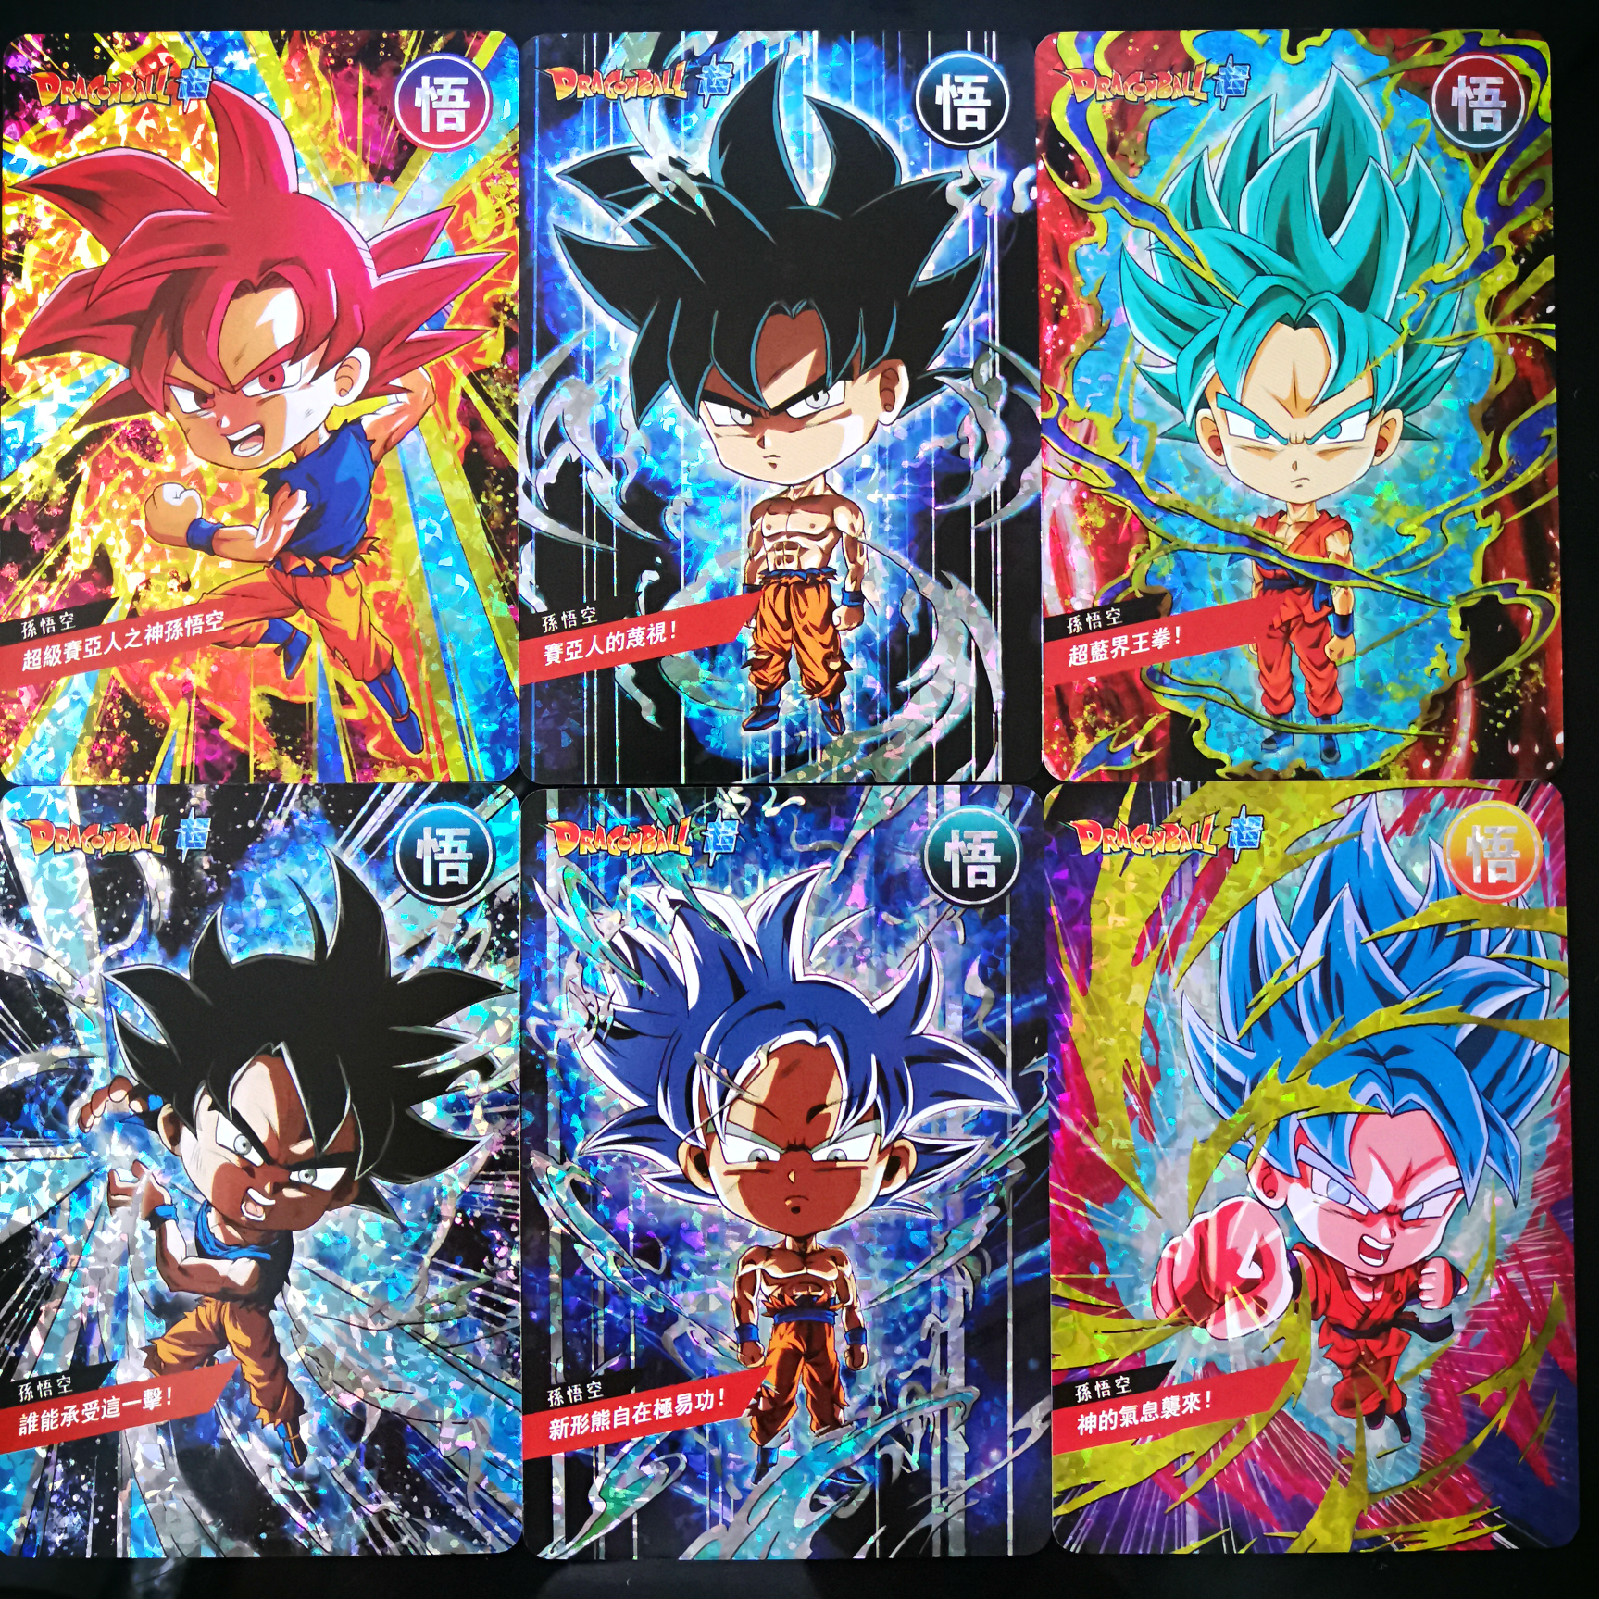 10pcs/set Q Super Dragon Ball Limited To 50 Sets Heroes Battle Card Ultra Instinct Goku Vegeta Super Game Collection Cards